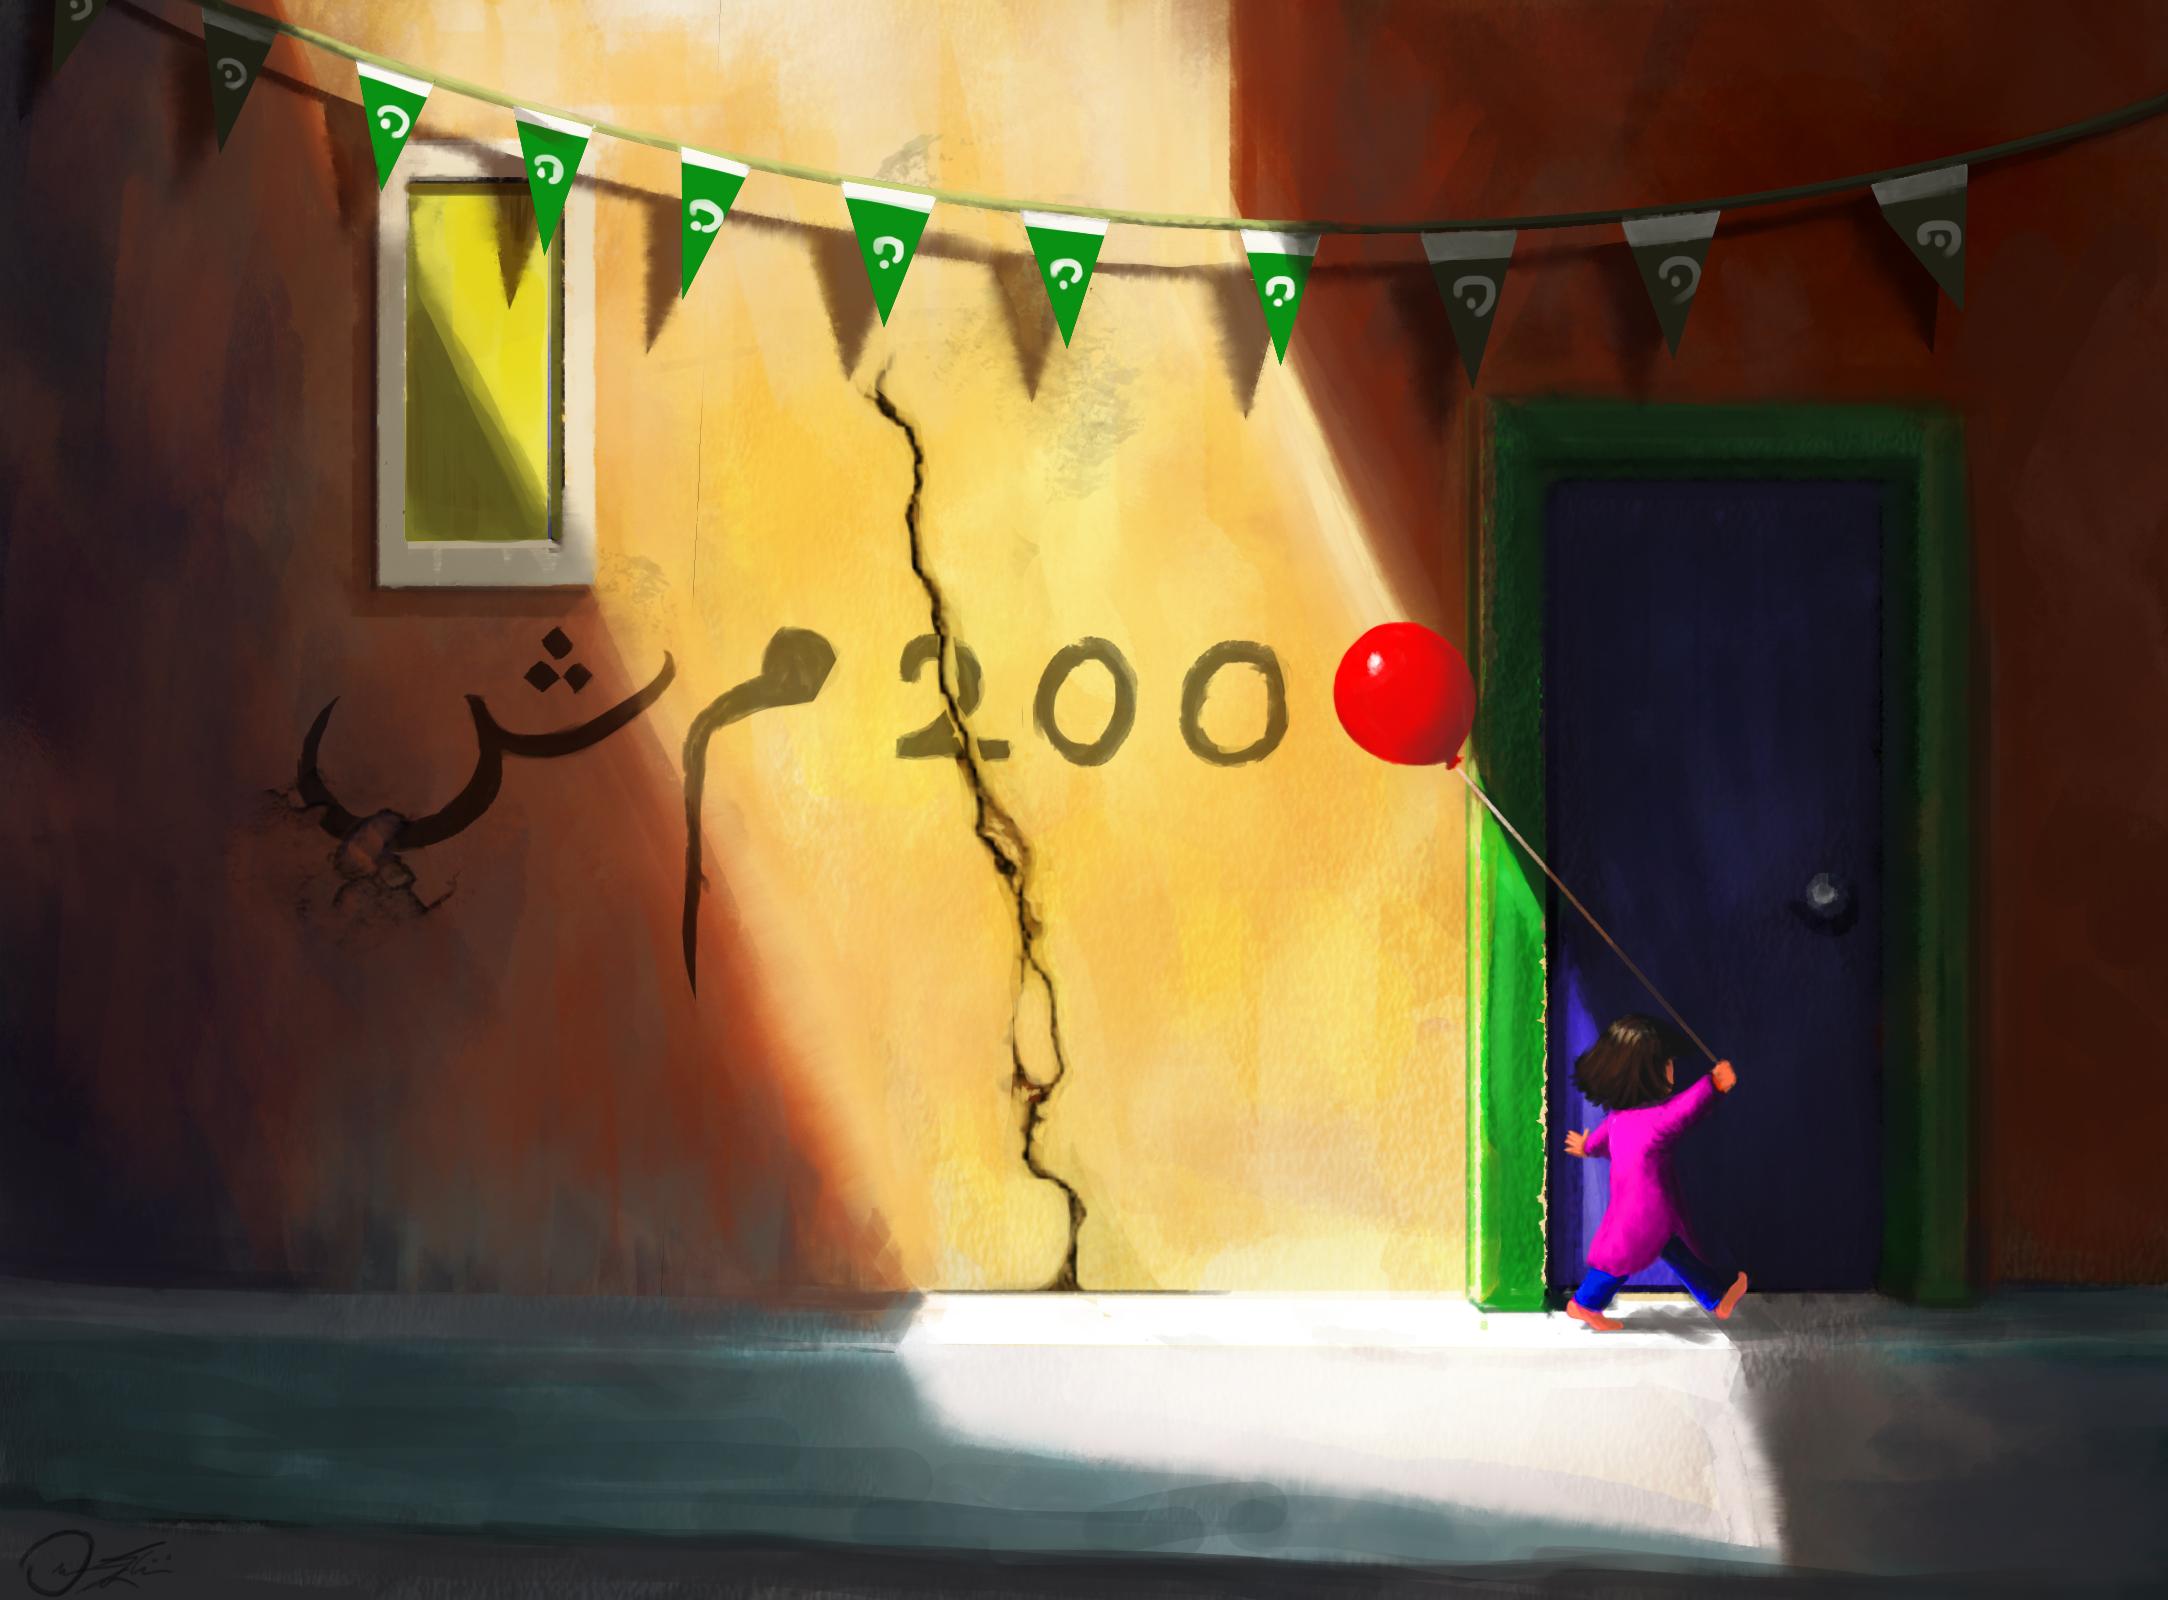 balloongirl2000.jpg